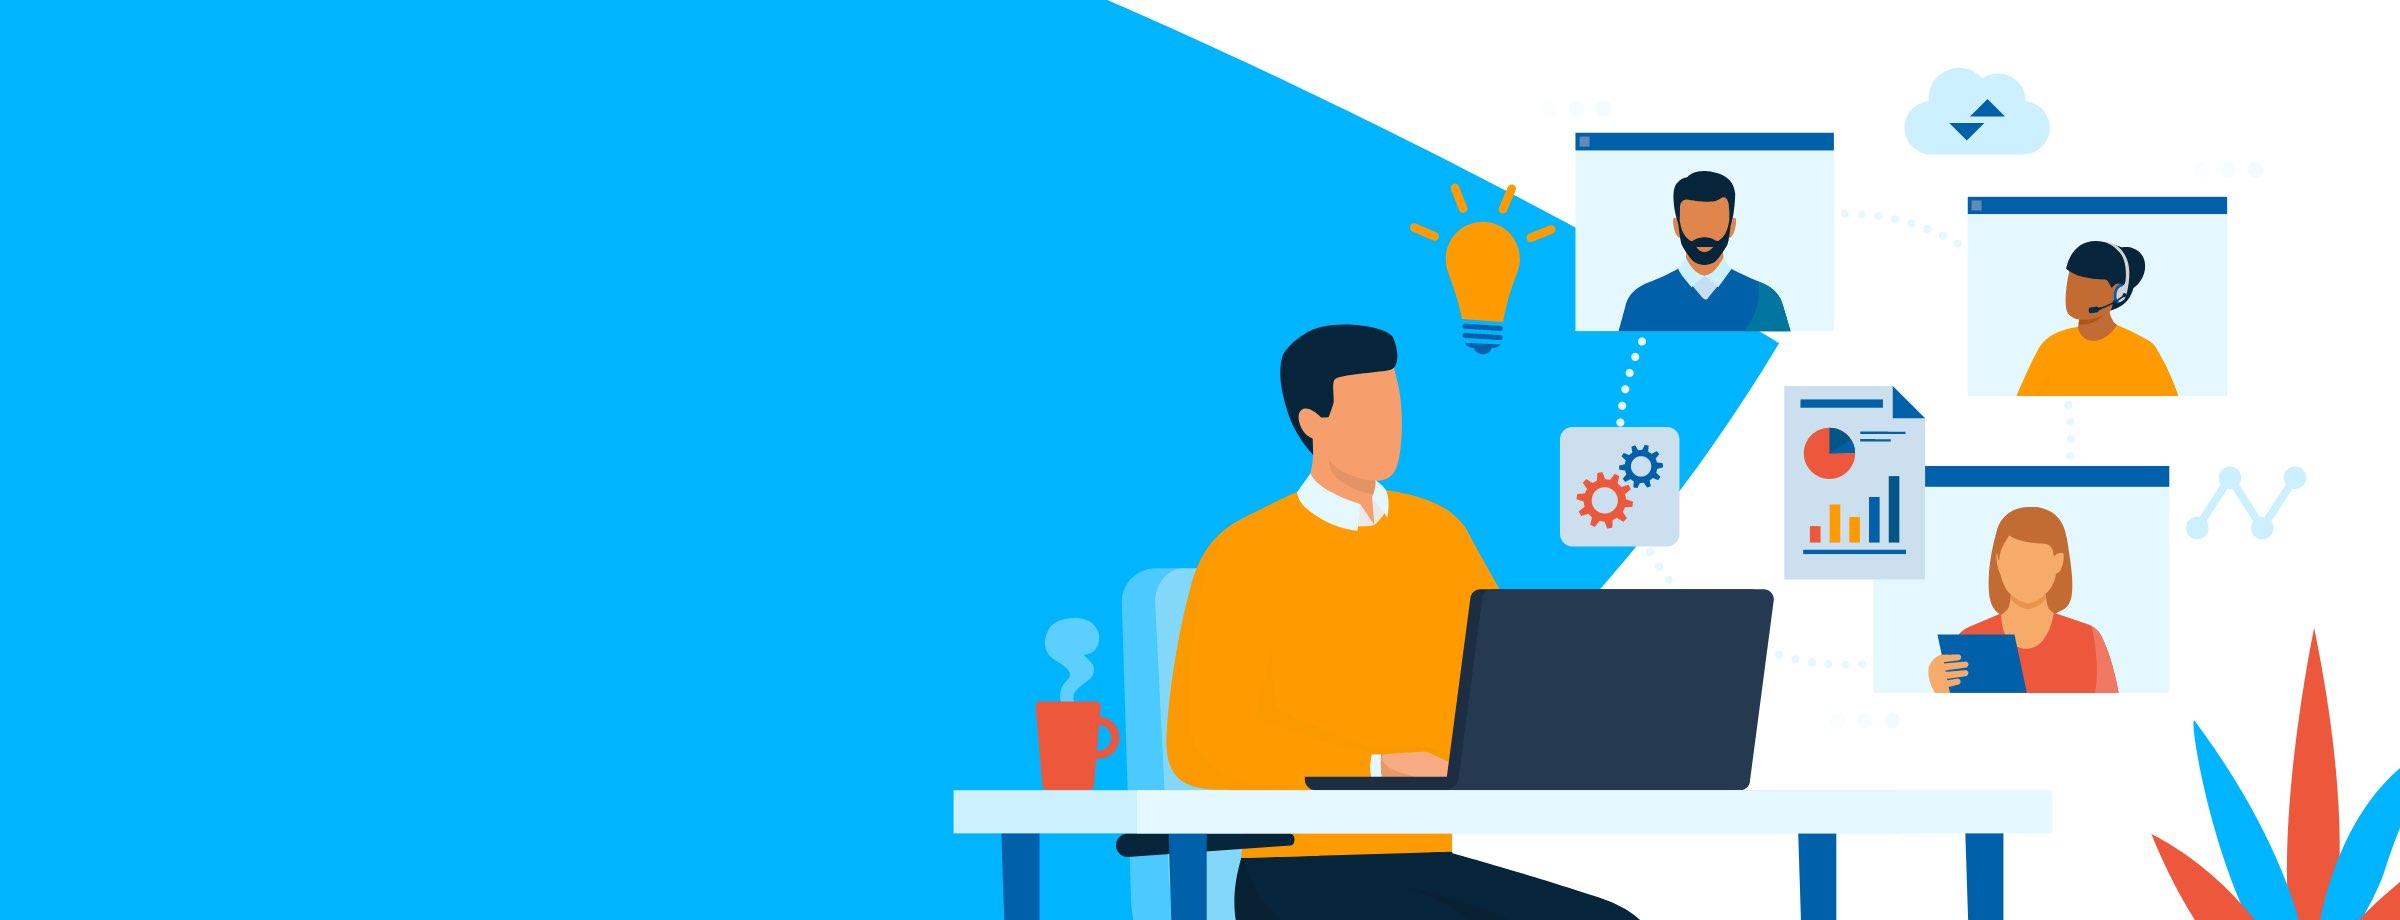 Introducing Azure Virtual Desktop (AVD)